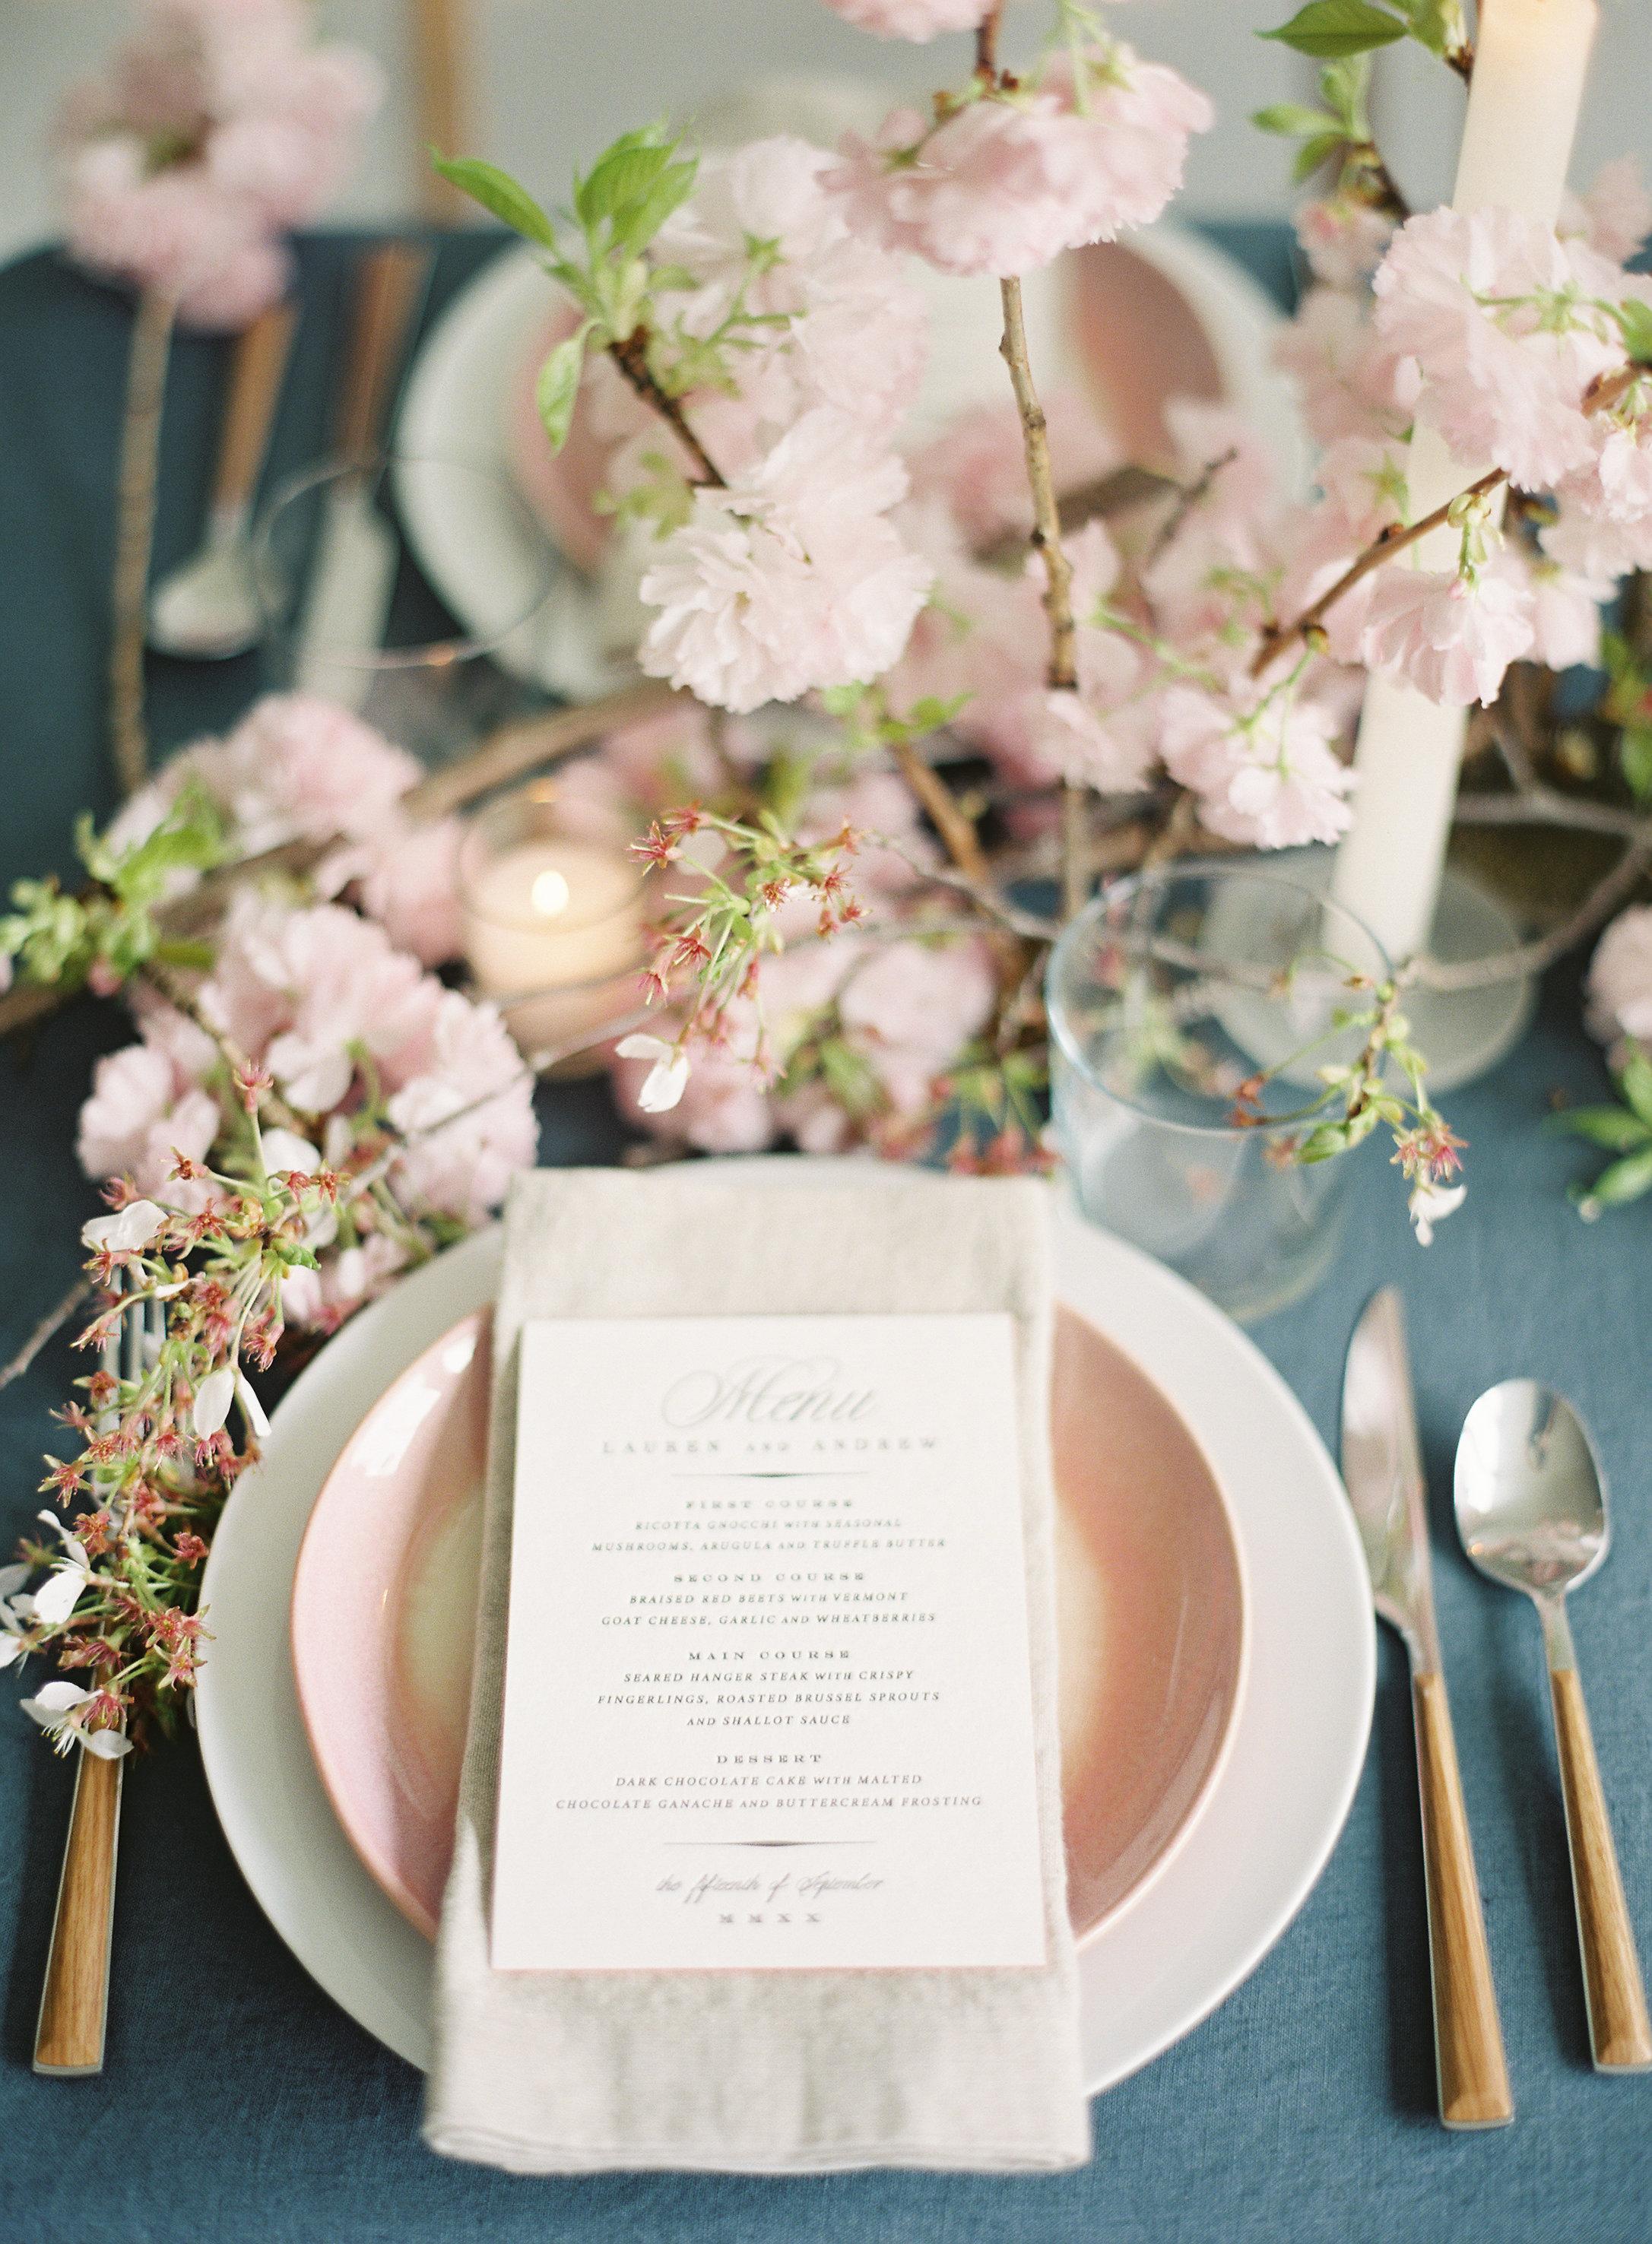 Cherry Blossom Centerpiece by Wild Green Yonder